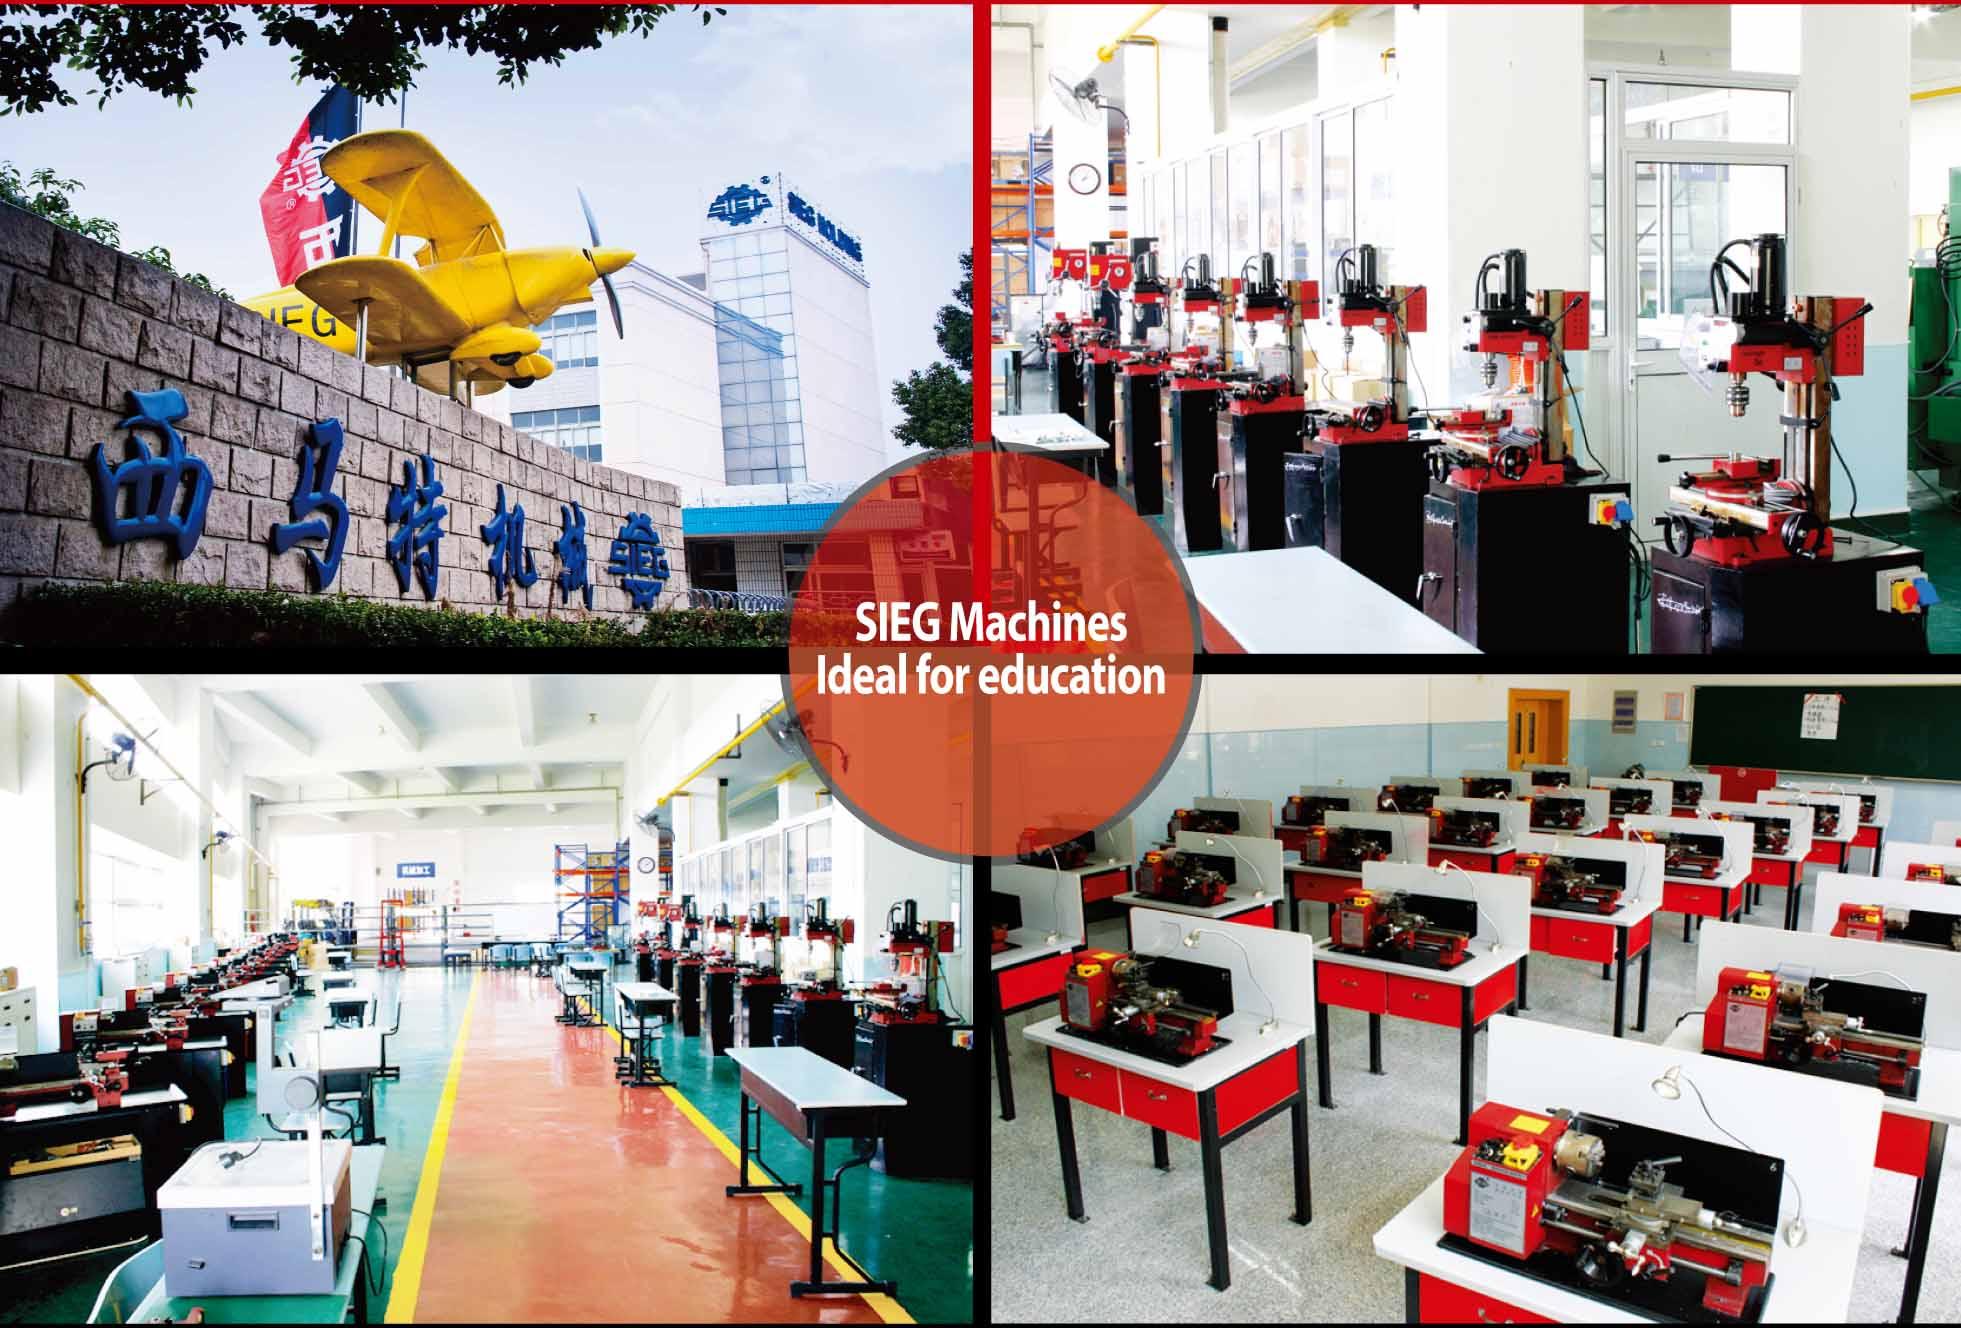 SIEG Machines Being Used in NTU Skill Center